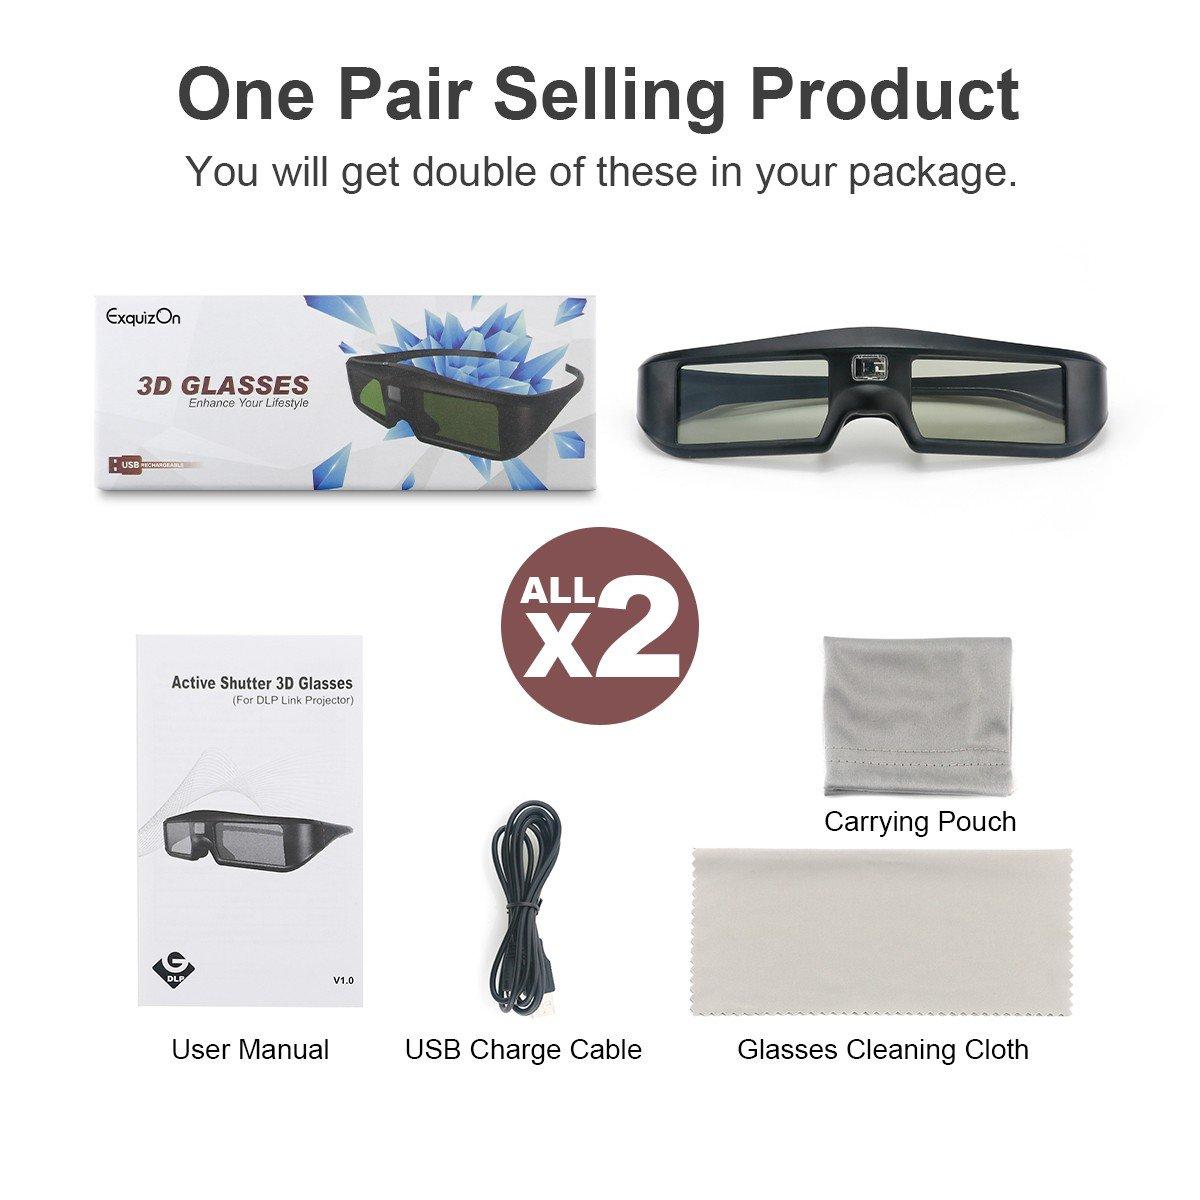 Exquizon 2 Packs Ultra-Clear HD 96-144Hz DLP LINK 3D Active Rechargeable Shutter Glasses for All 3D DLP Projectors BenQ, Optoma, Dell, Mitsubishi, Samsung, Acer, Vivitek, NEC, Sharp, ViewSonic & Endle